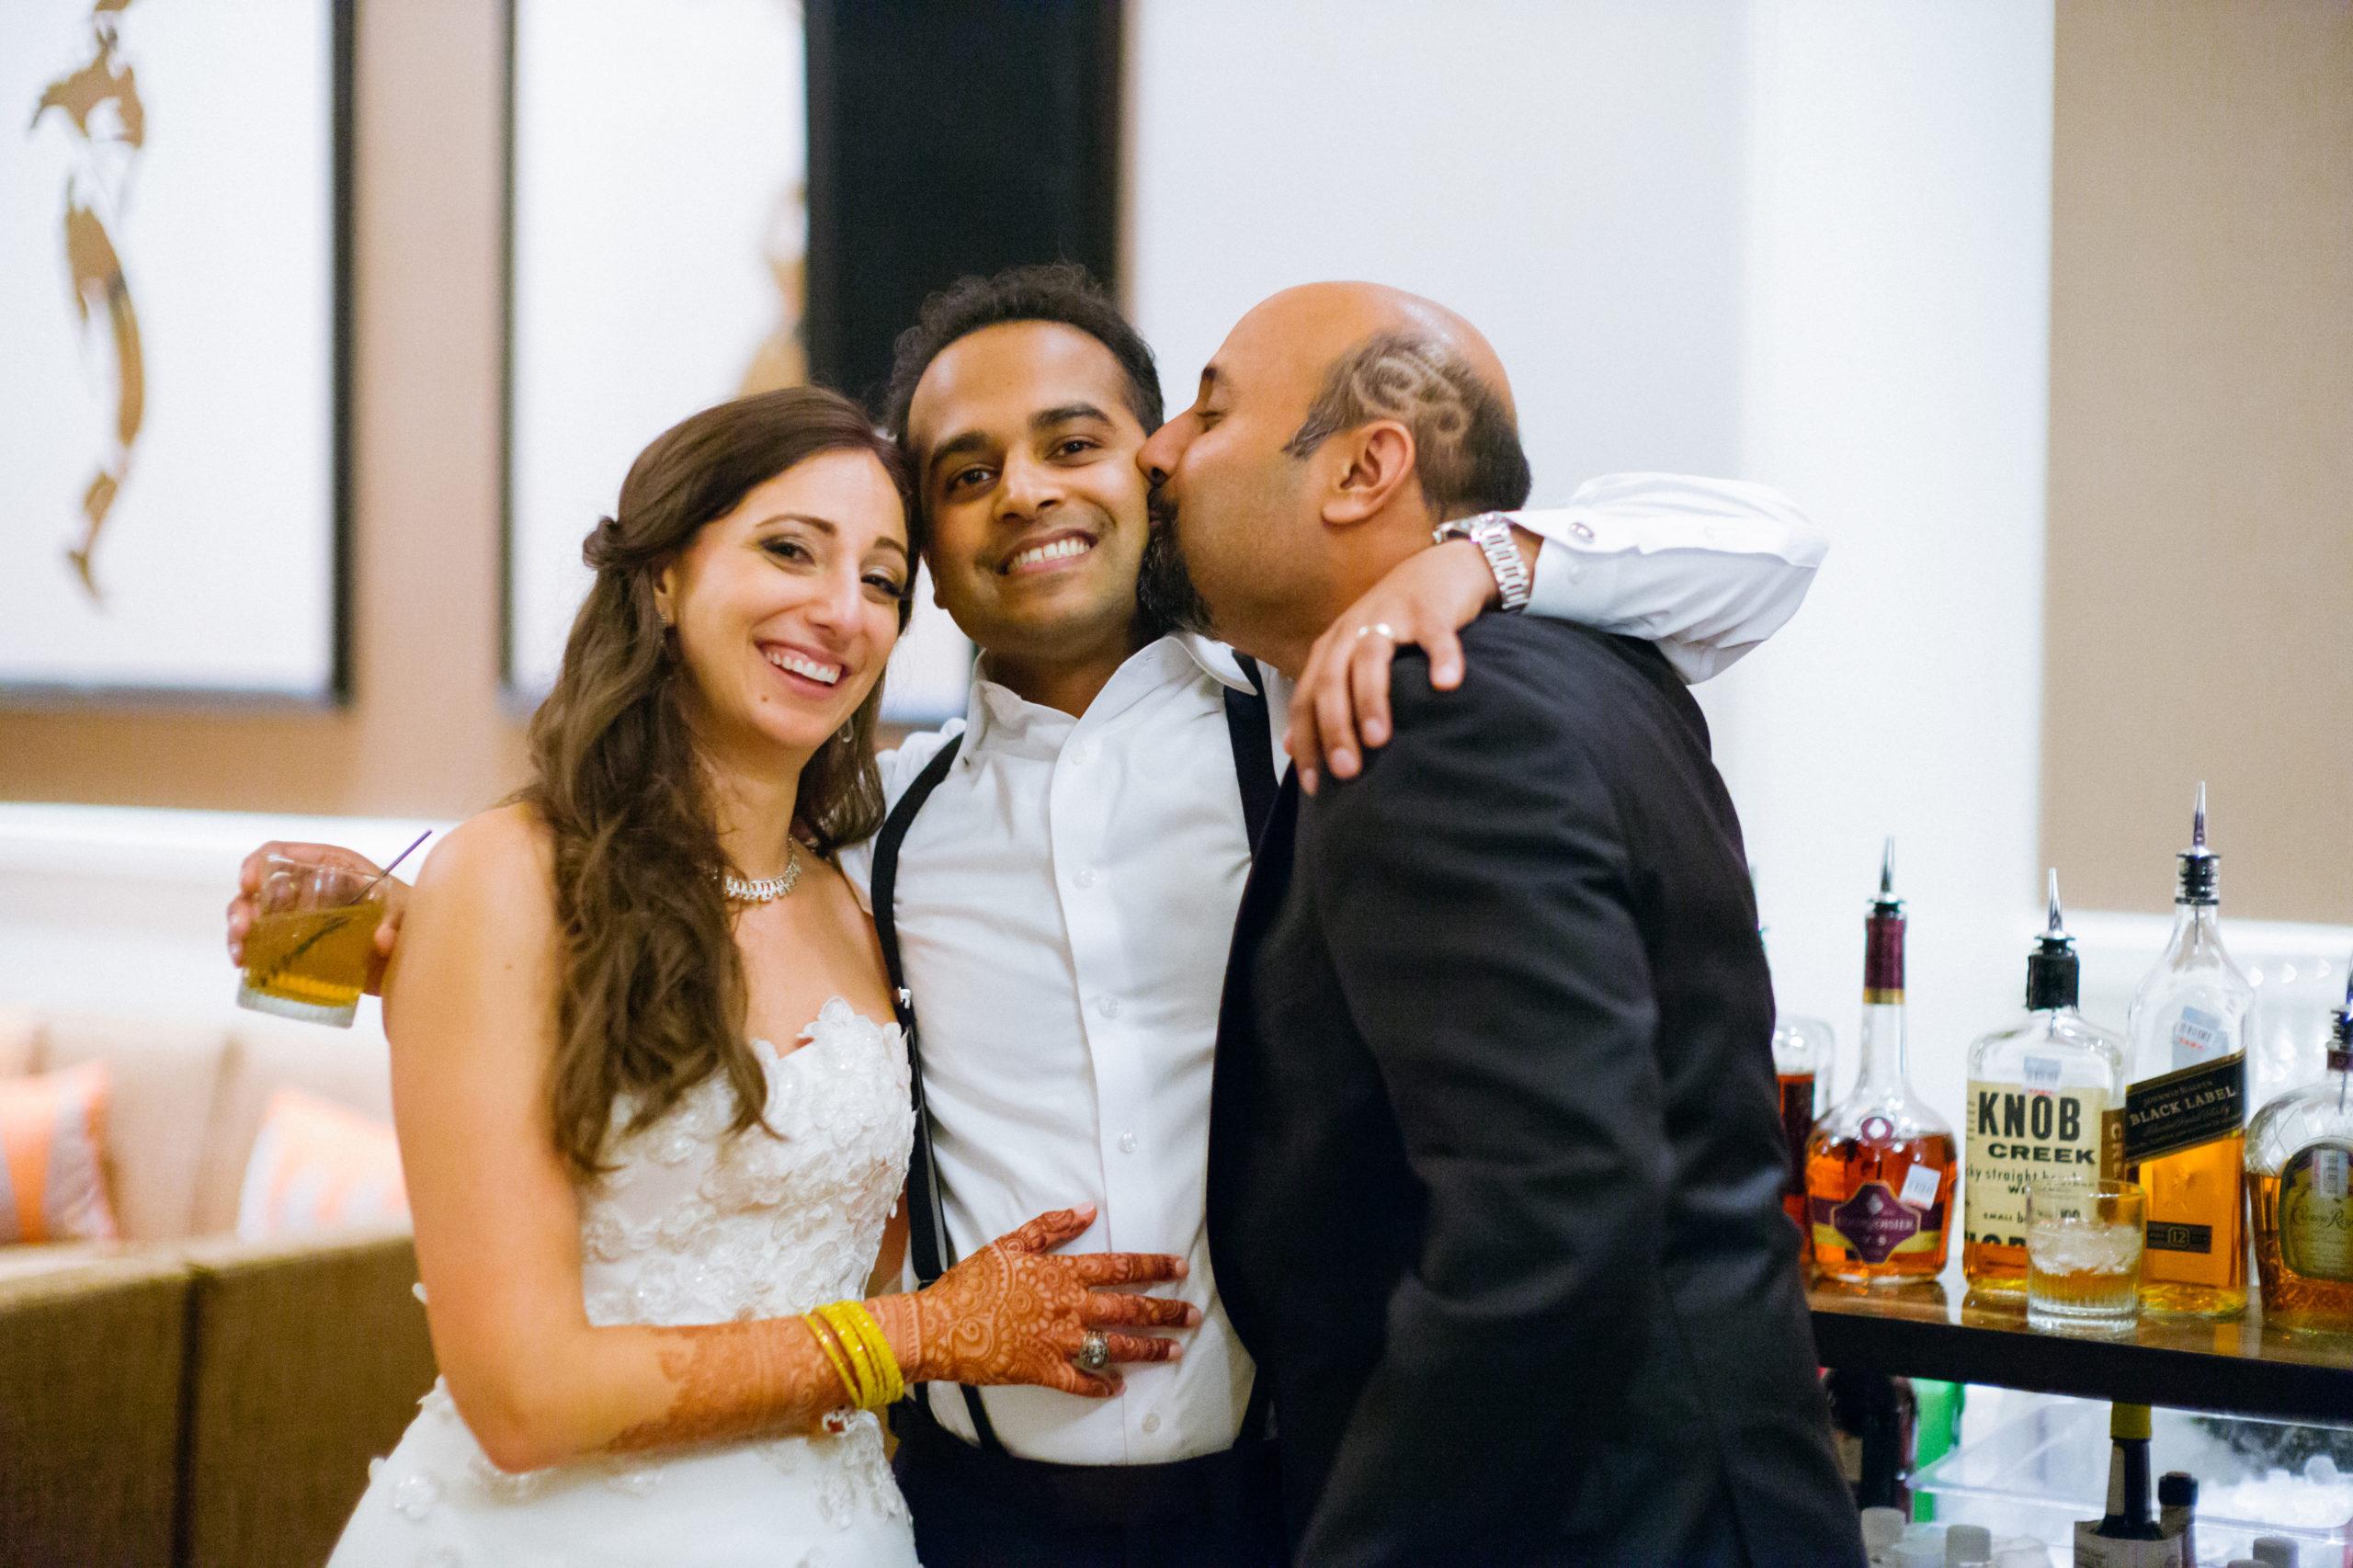 Friends gather in photo Hindu Jewish fusion wedding Sugar Land Marriott Hotel Texas-101